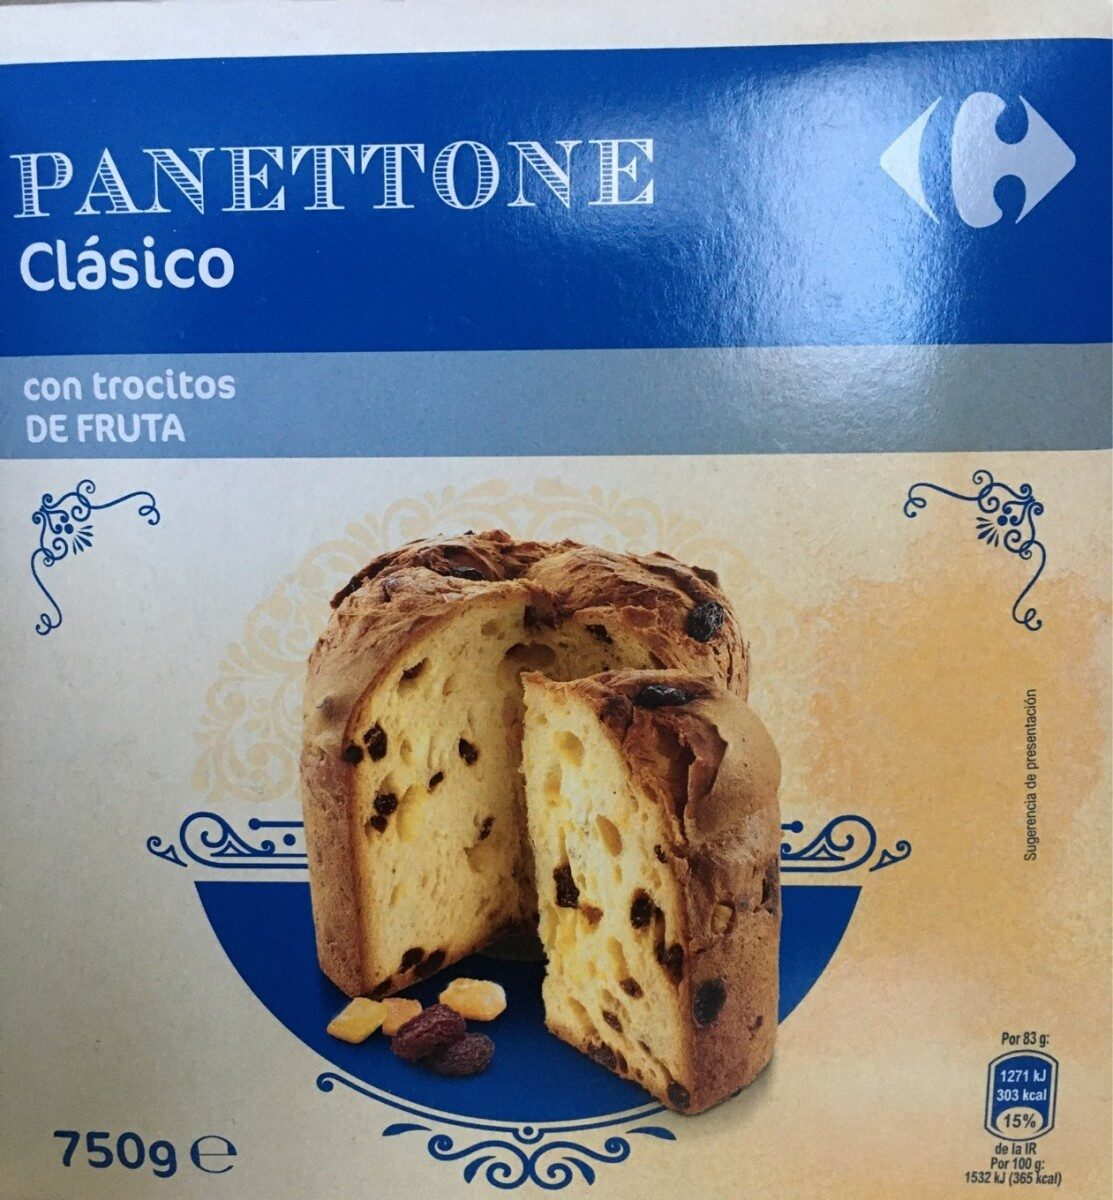 PANETTONE clásico - Producto